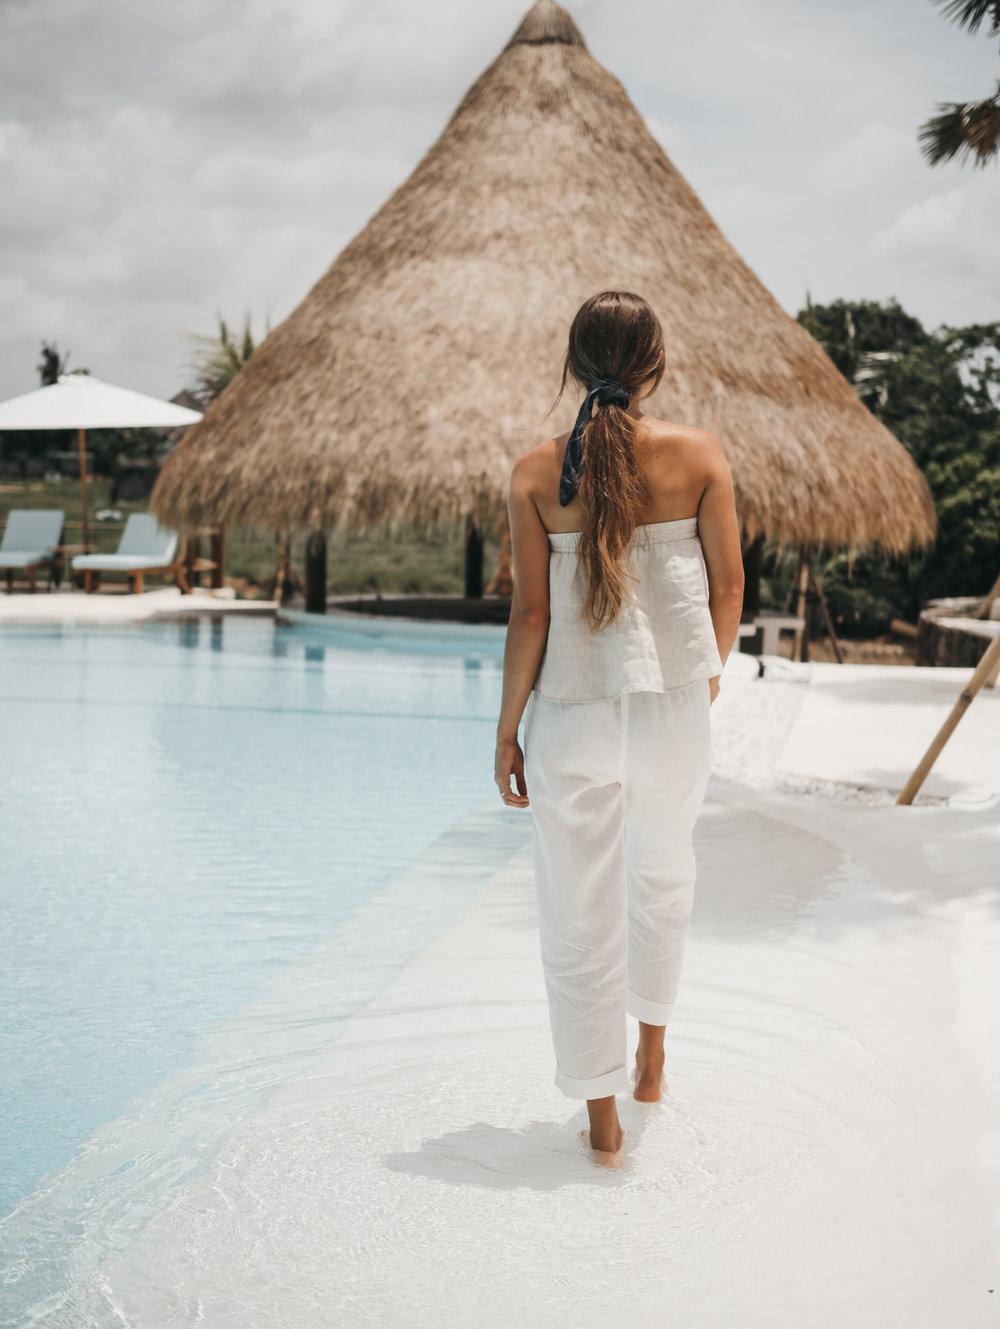 keira_mason+Vegan_resort_wear-10.jpg